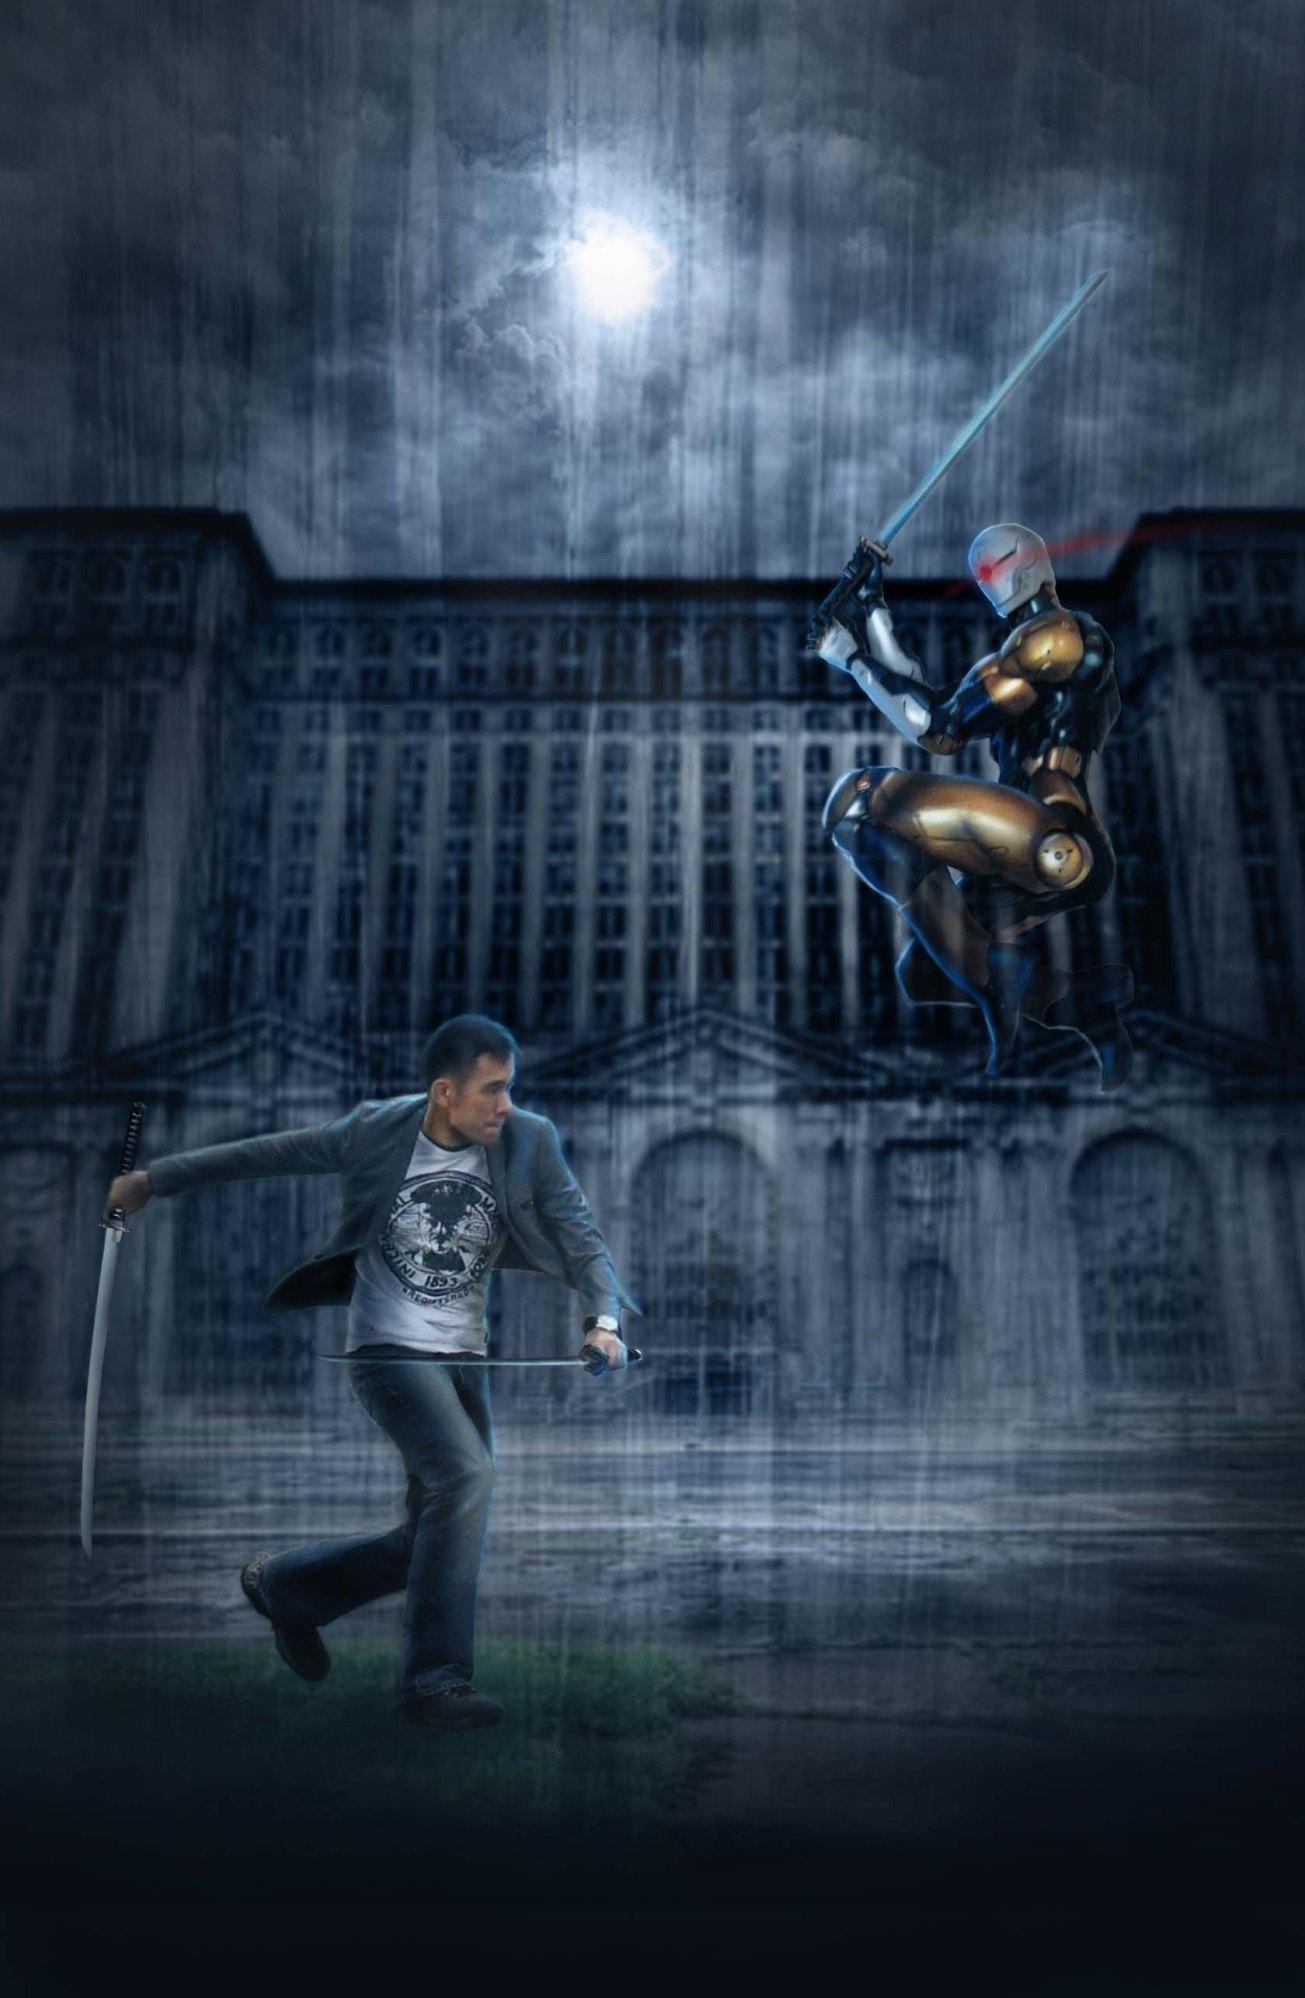 cyborg assassin 003